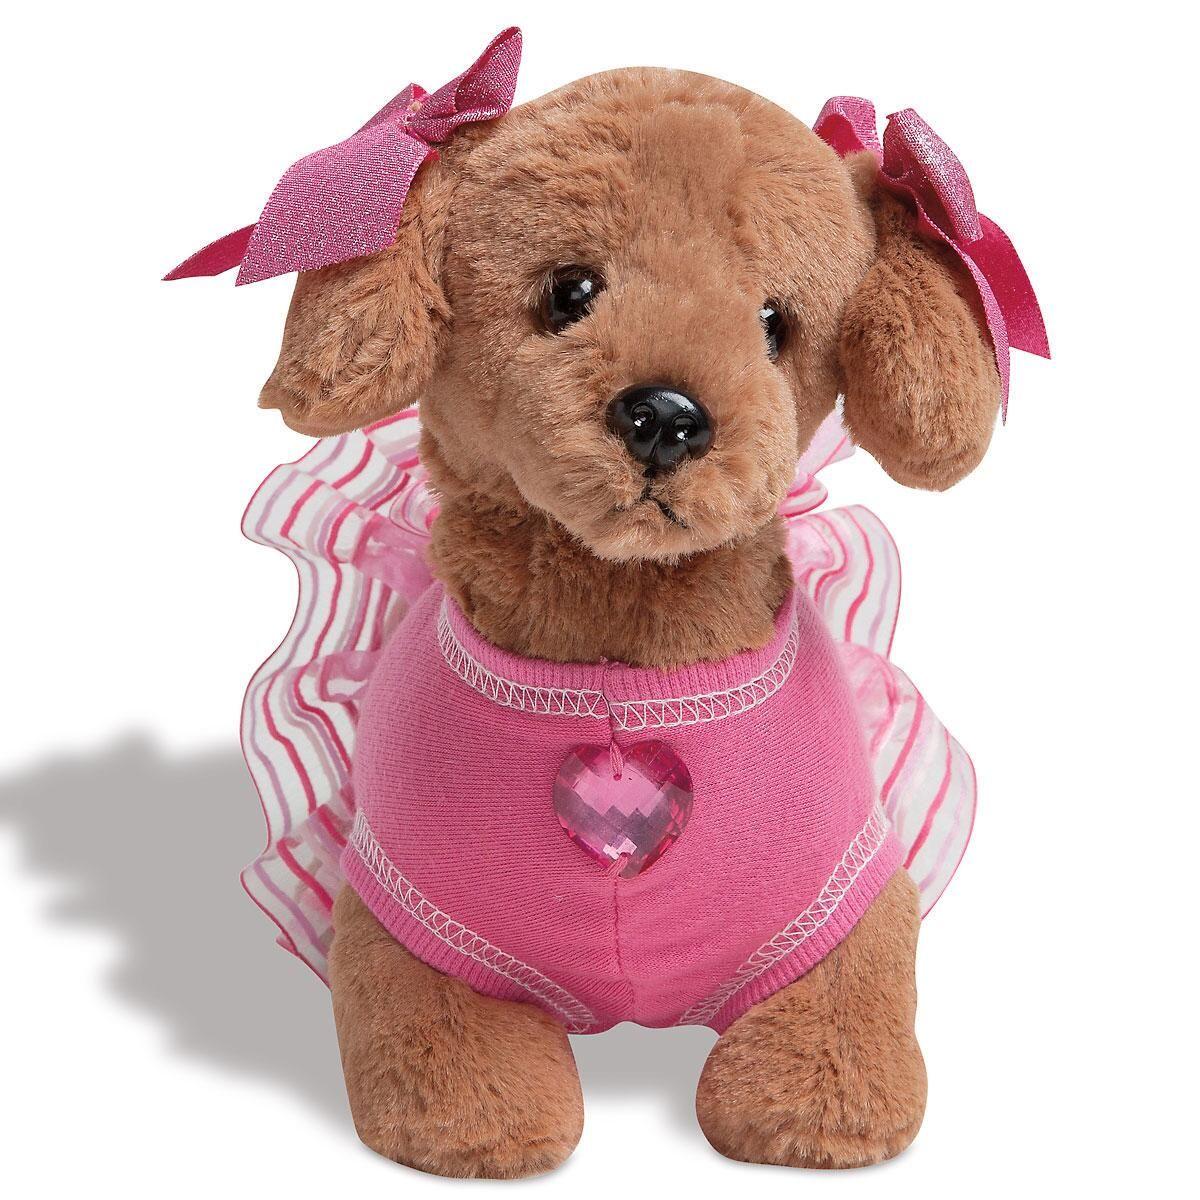 Haute Doggie Plush Dog by Bearington Collection